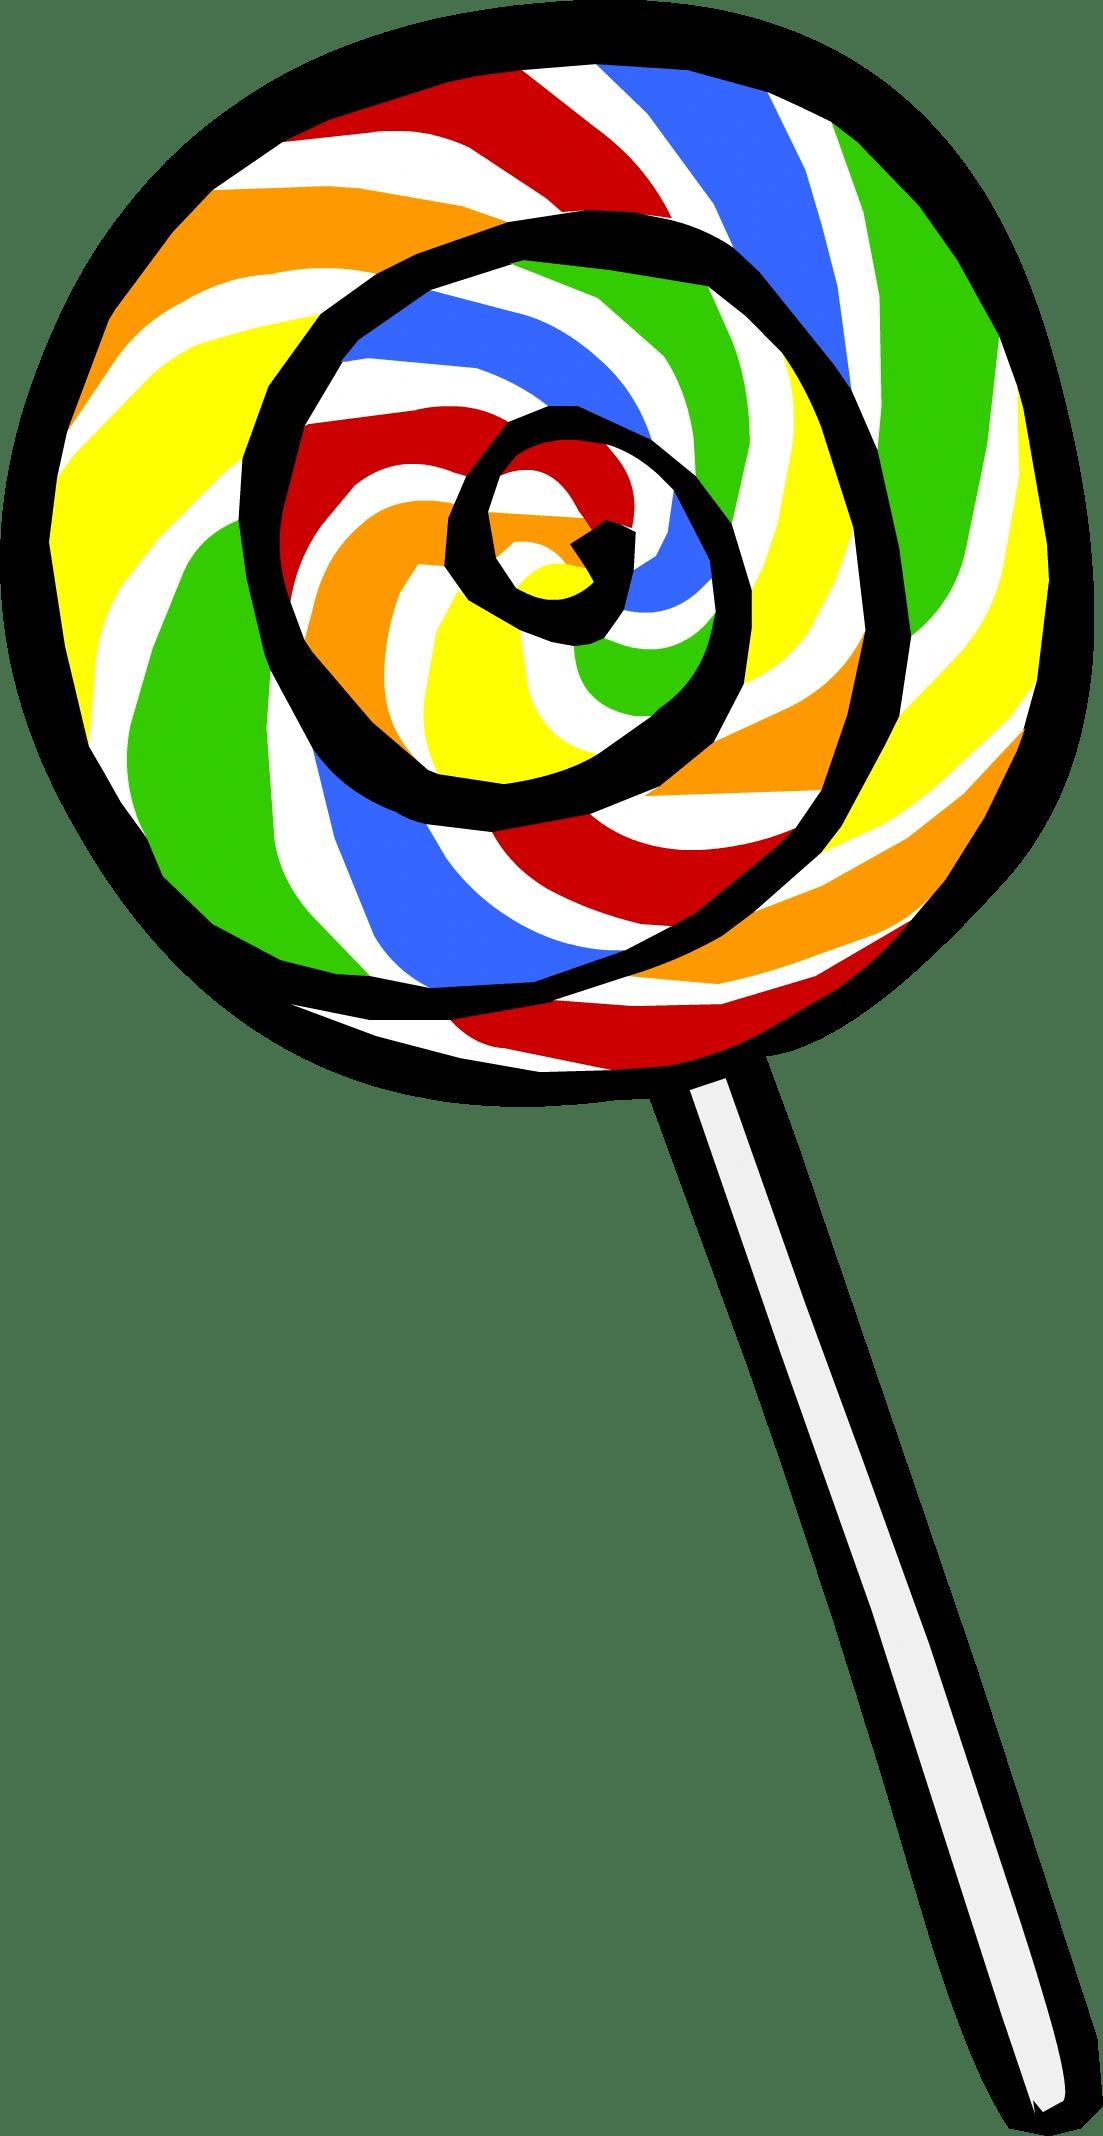 Lollipop Club Penguin Wiki FANDOM Powered By Wikia